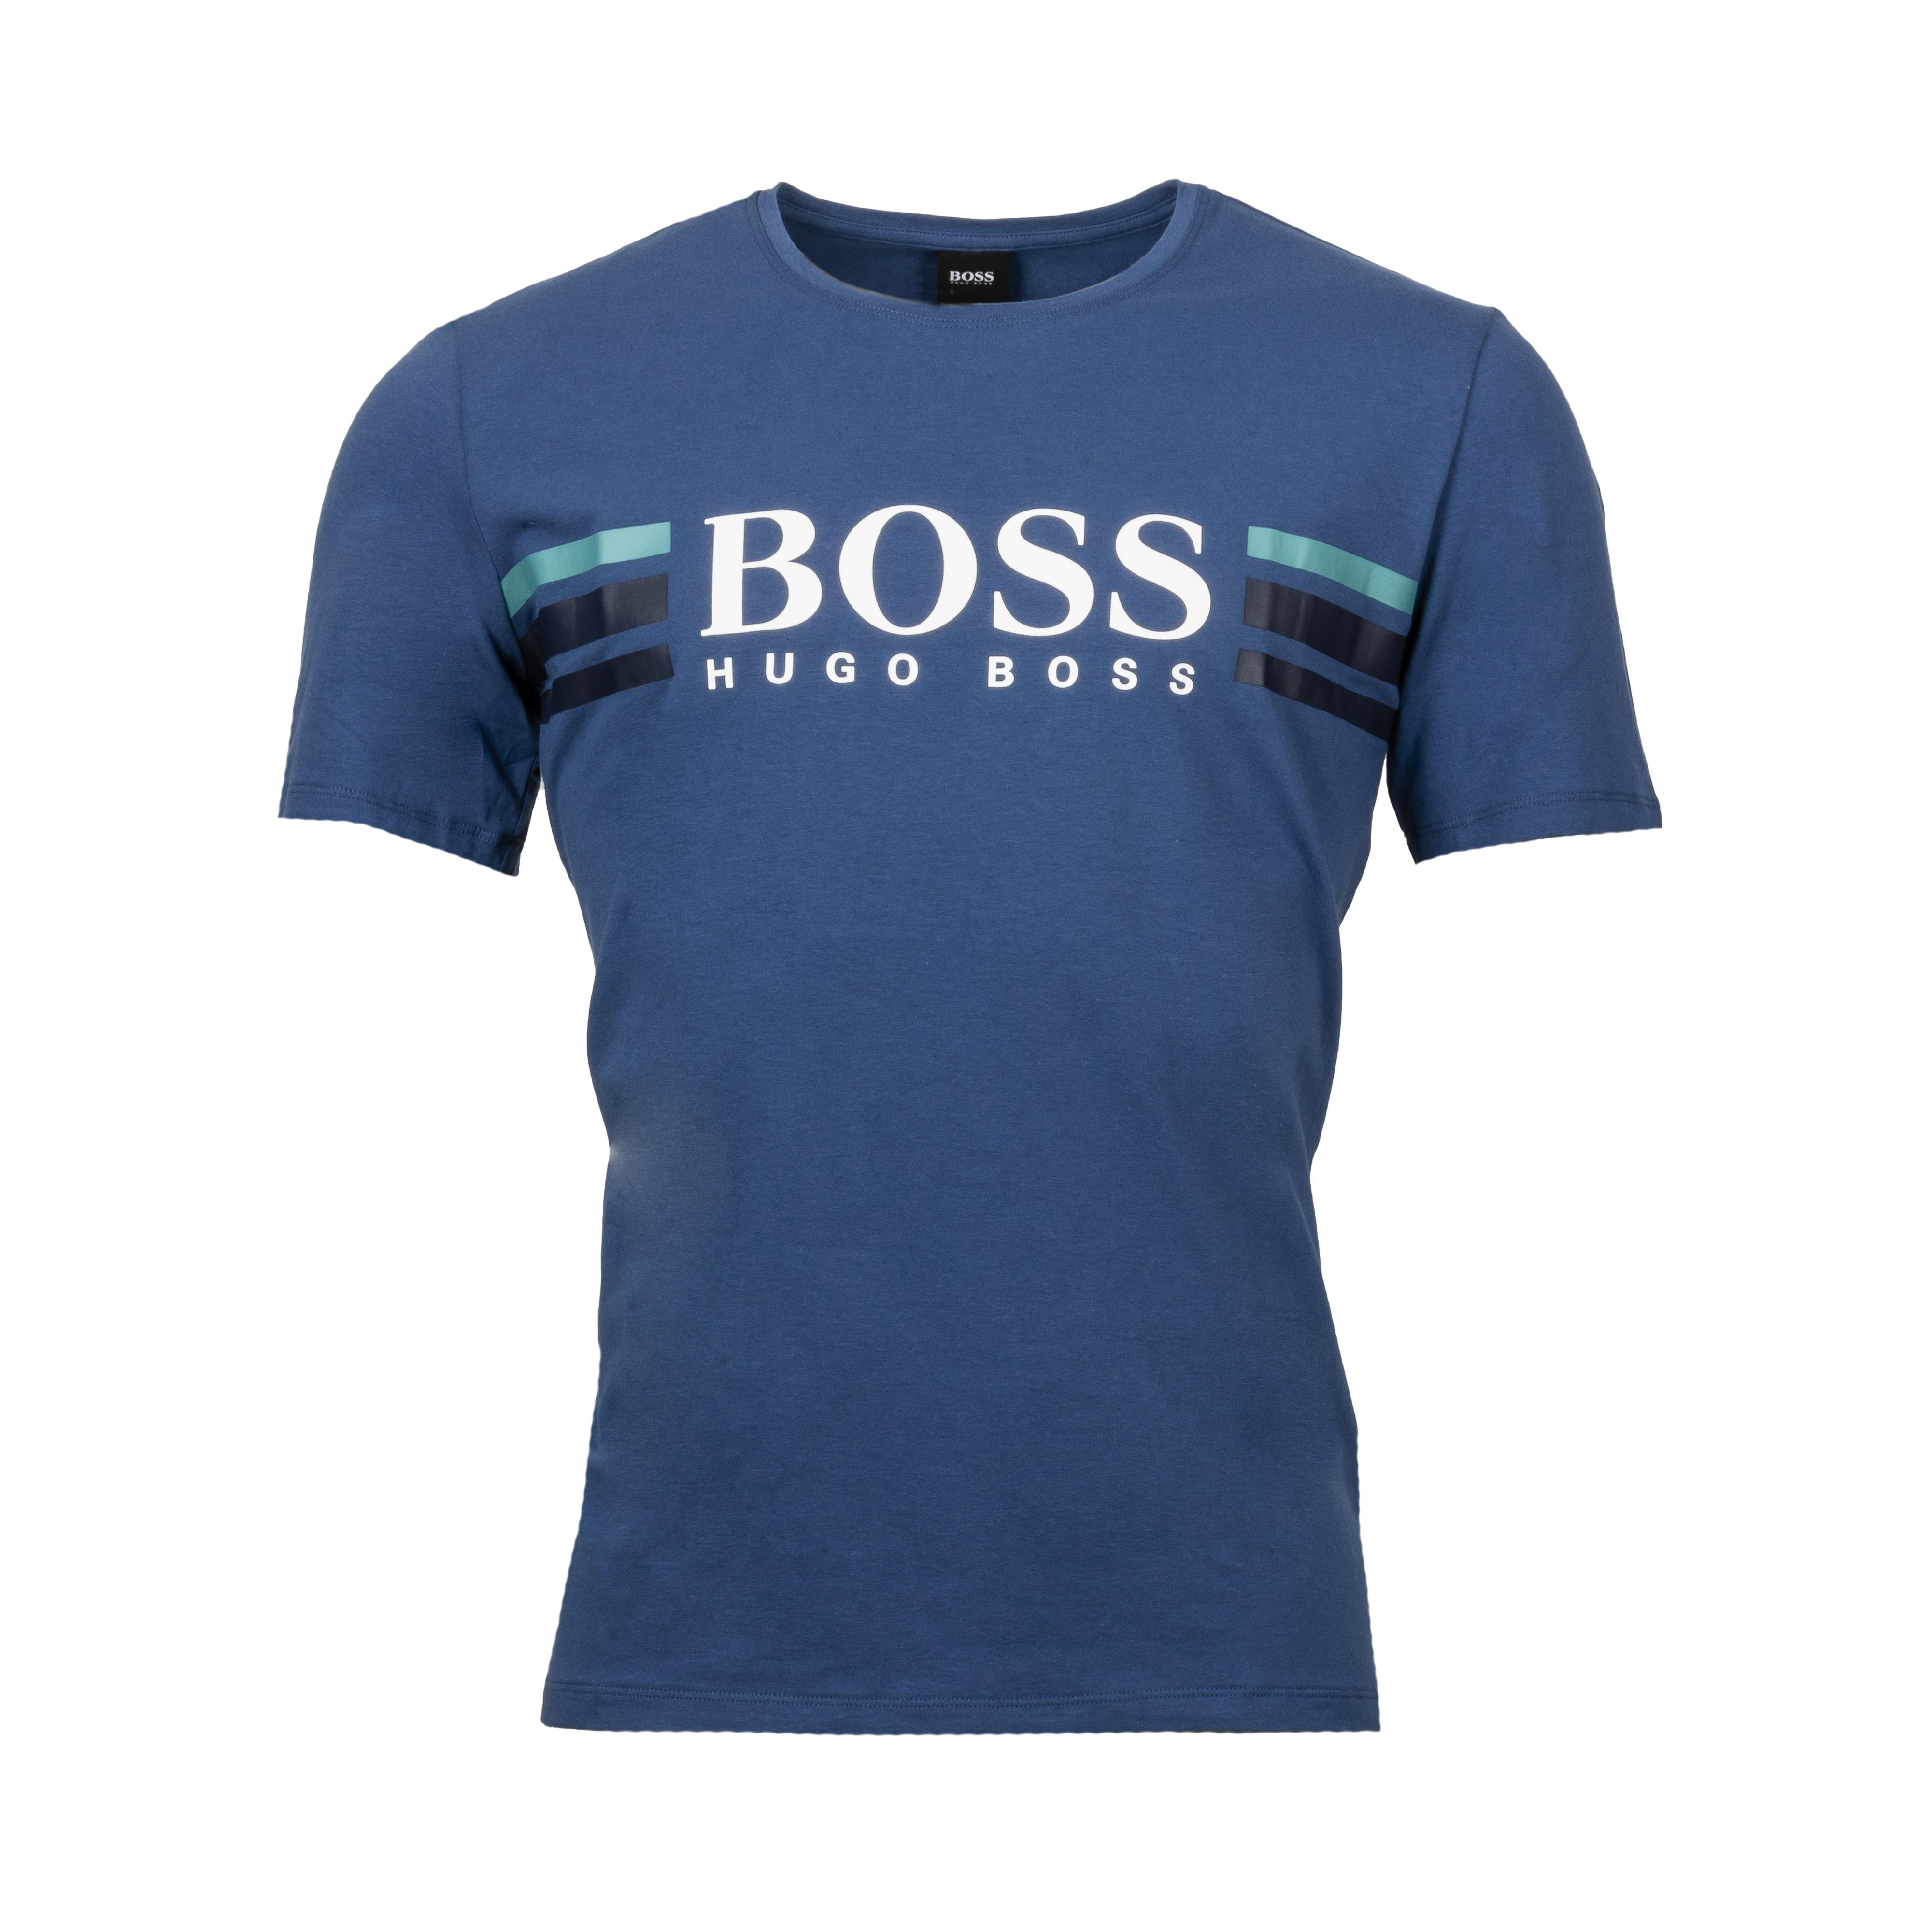 Tee-shirt col rond  urban en coton stretch bleu marine